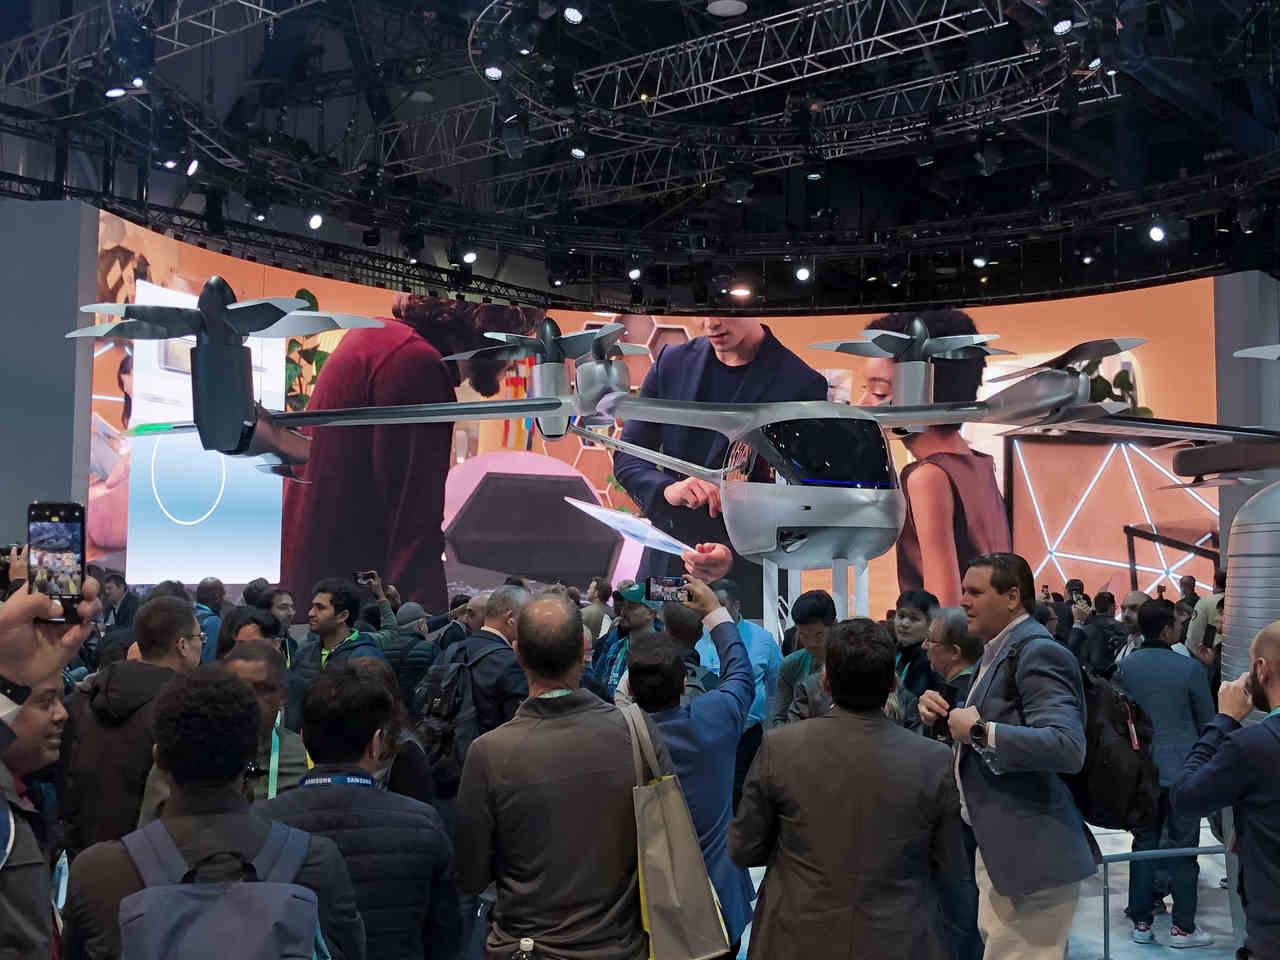 feira tecnologia mobilidade ces 2020 las vegas